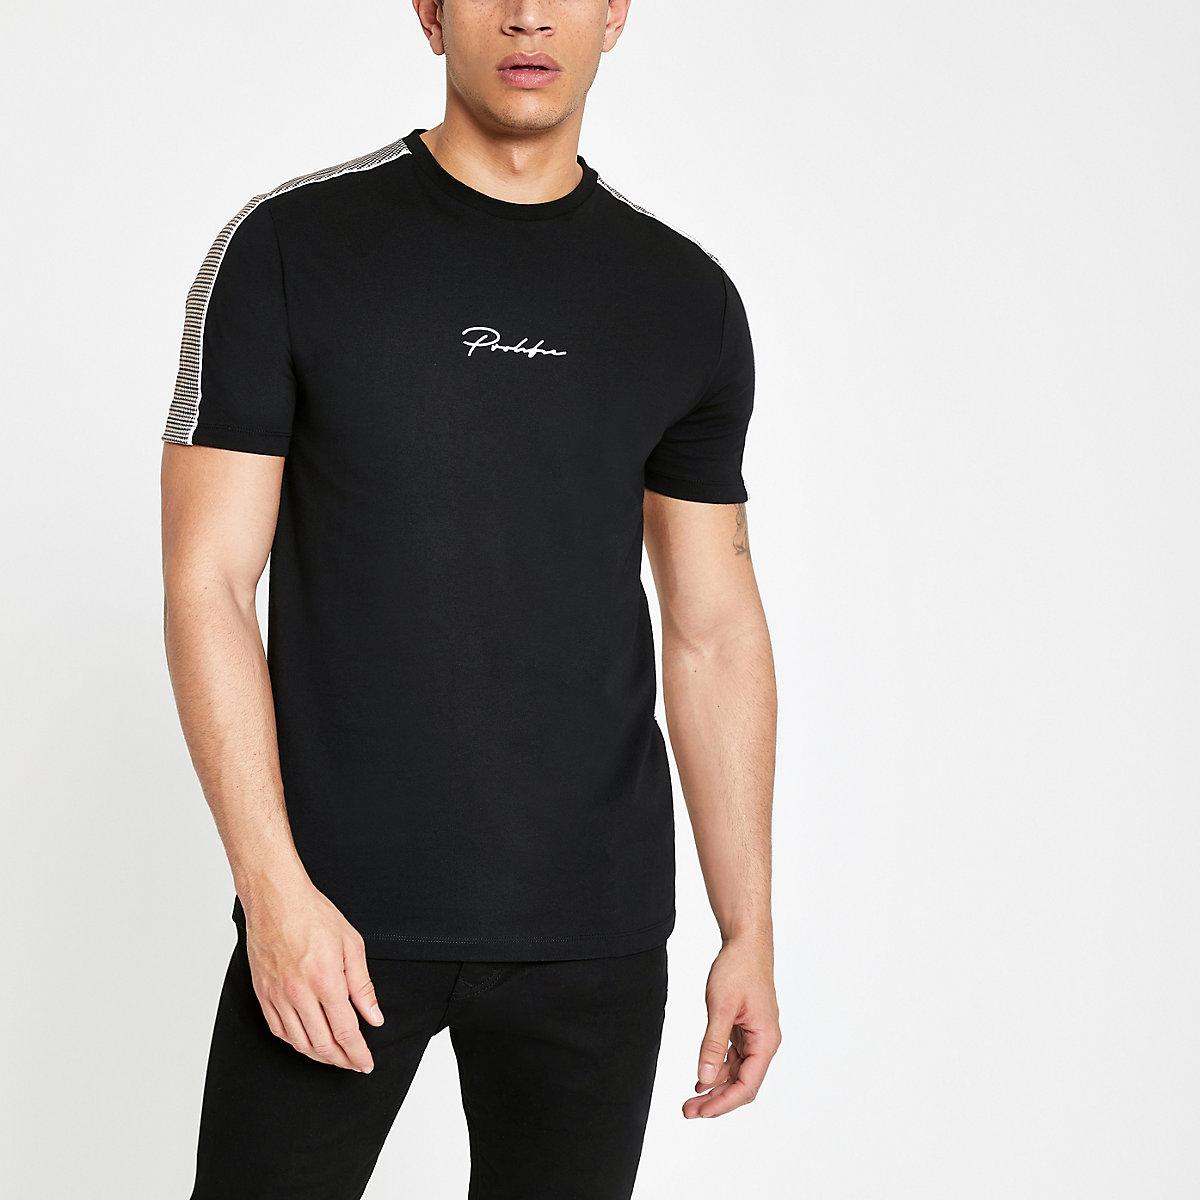 Black slim fit 'Prolific' check back T-shirt